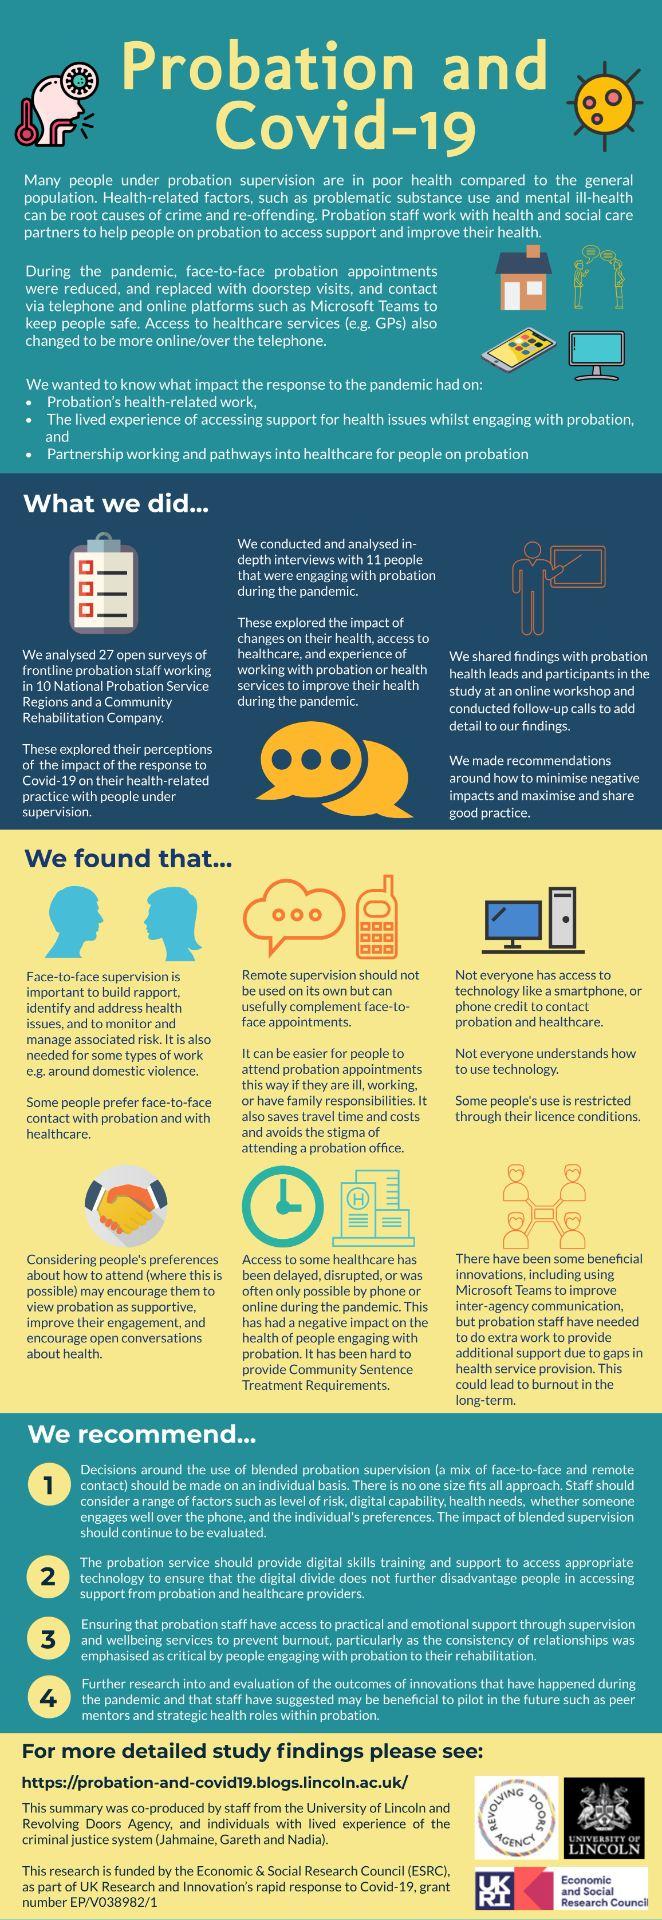 Info graphic summarising findings